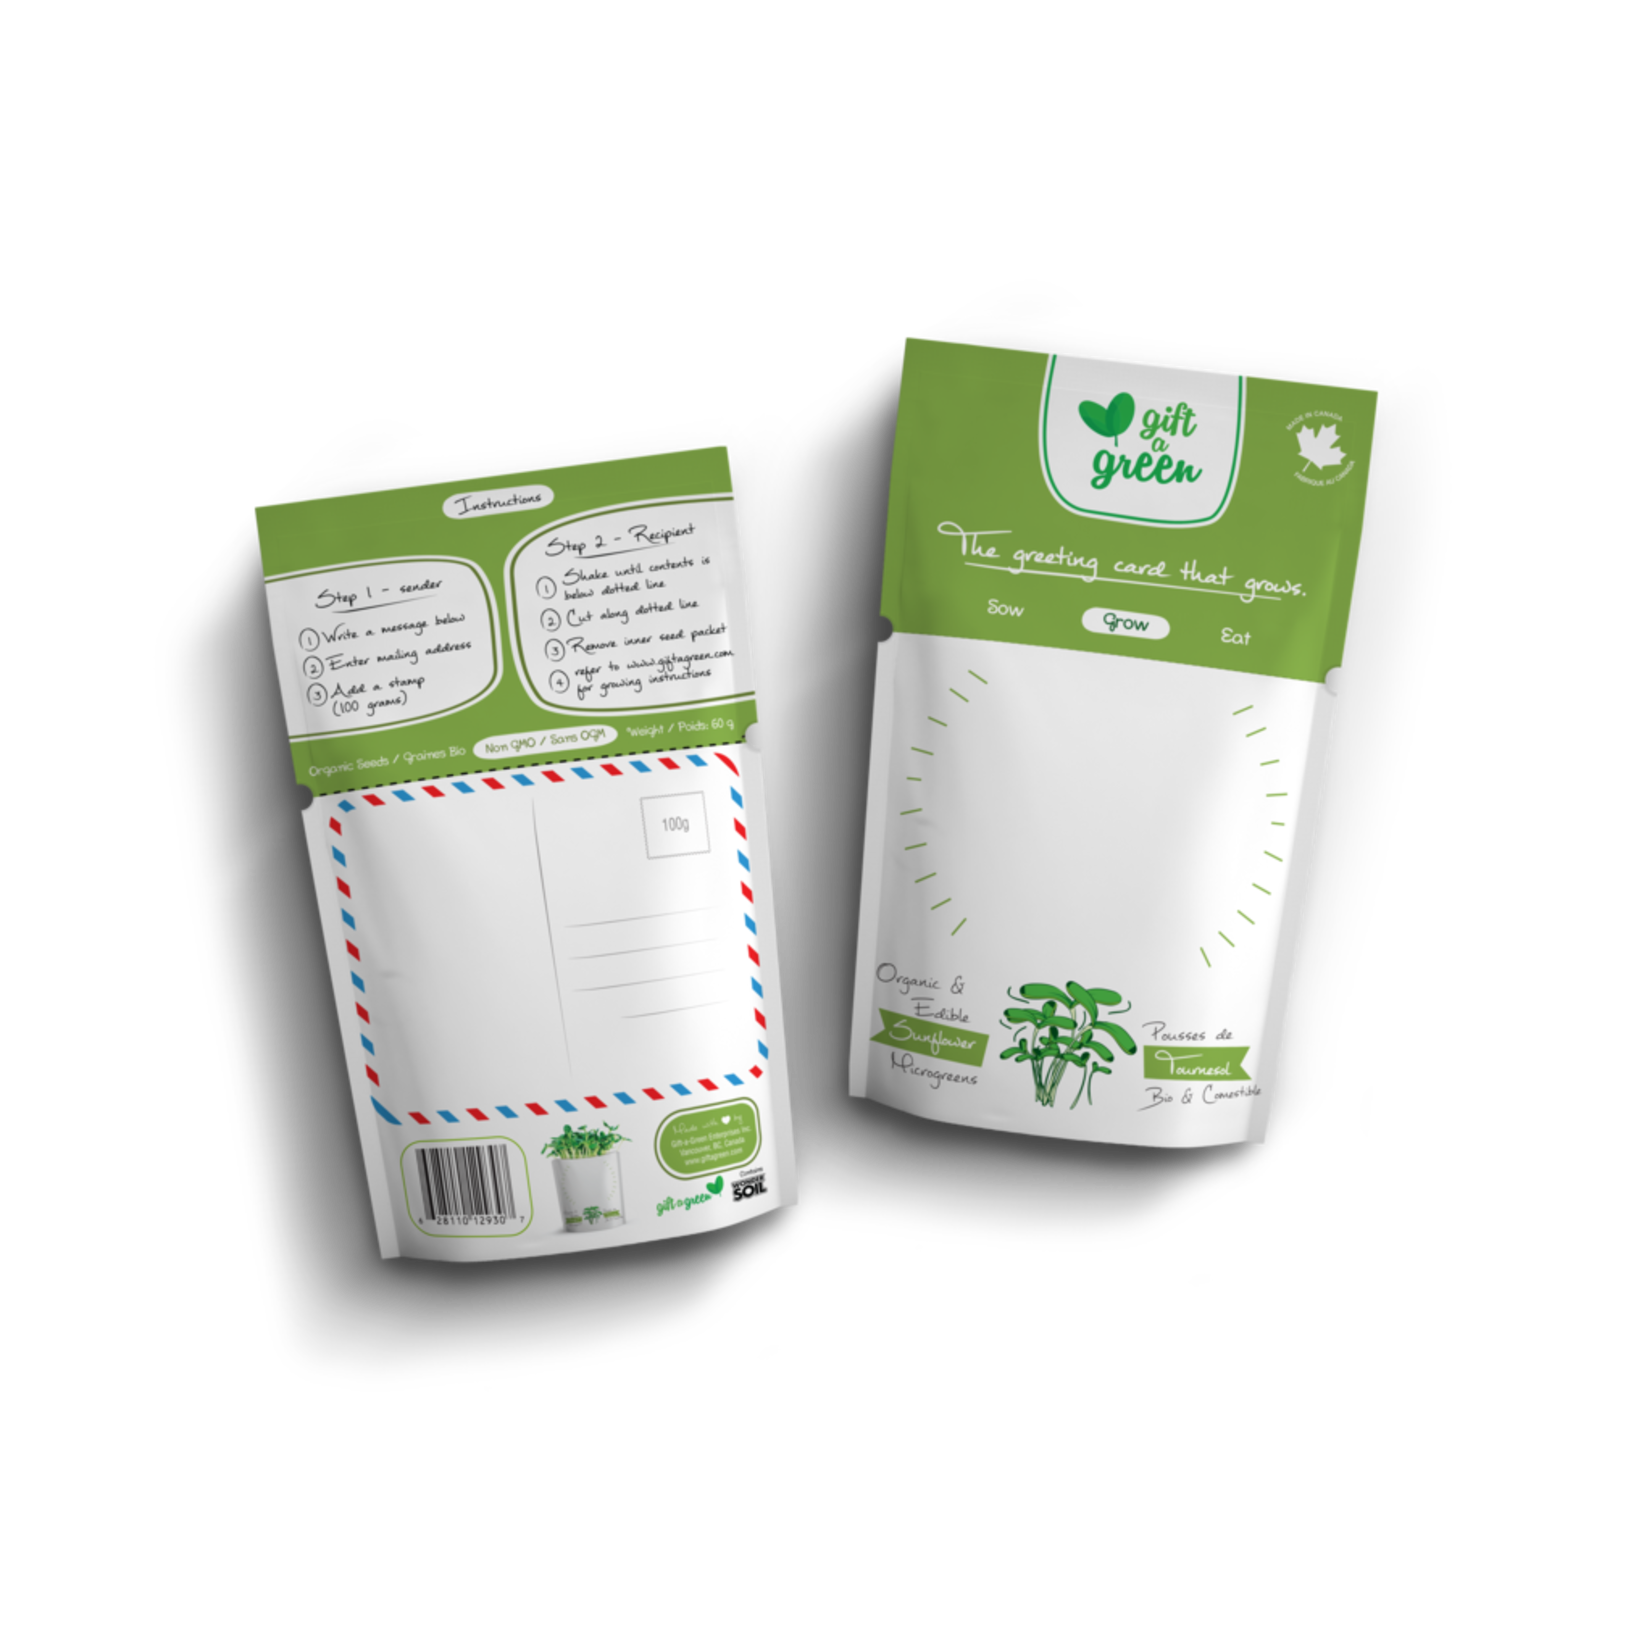 Gift A Green Microgreen Greeting Card Blank Write Your Own- Sunflower Microgreens